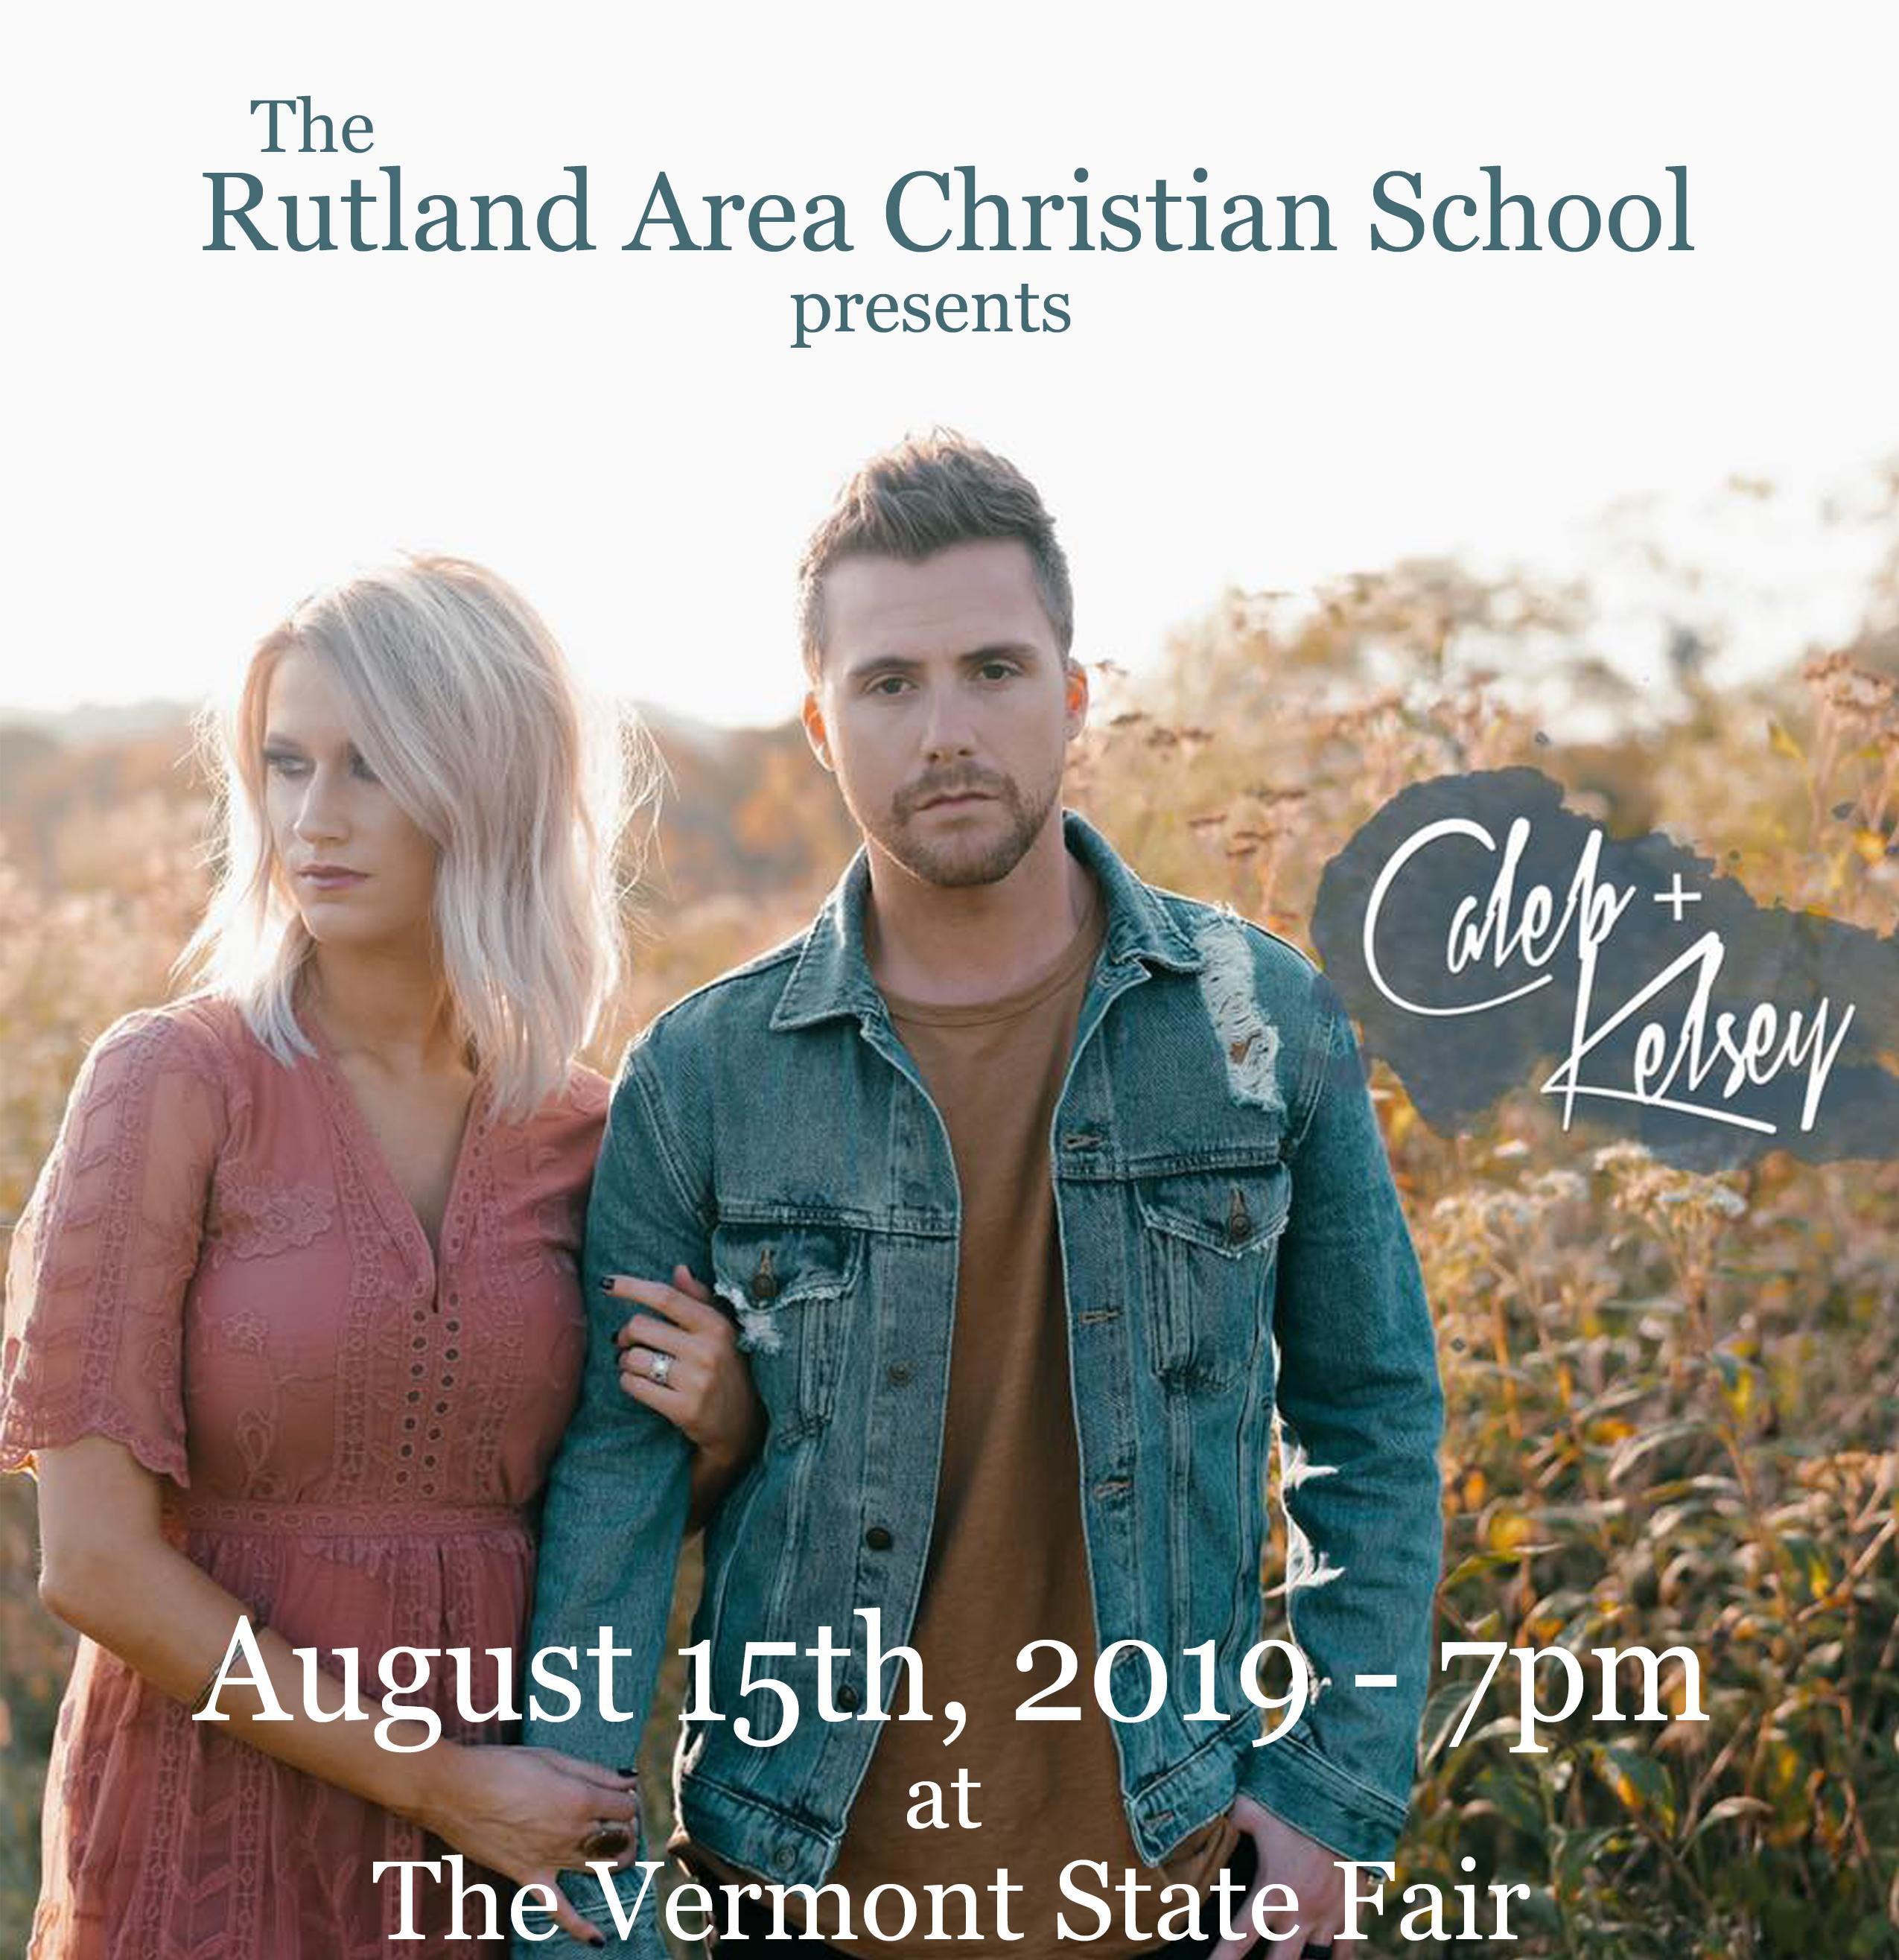 Caleb Kelsey Fundraiser Concert 15 Aug 2019